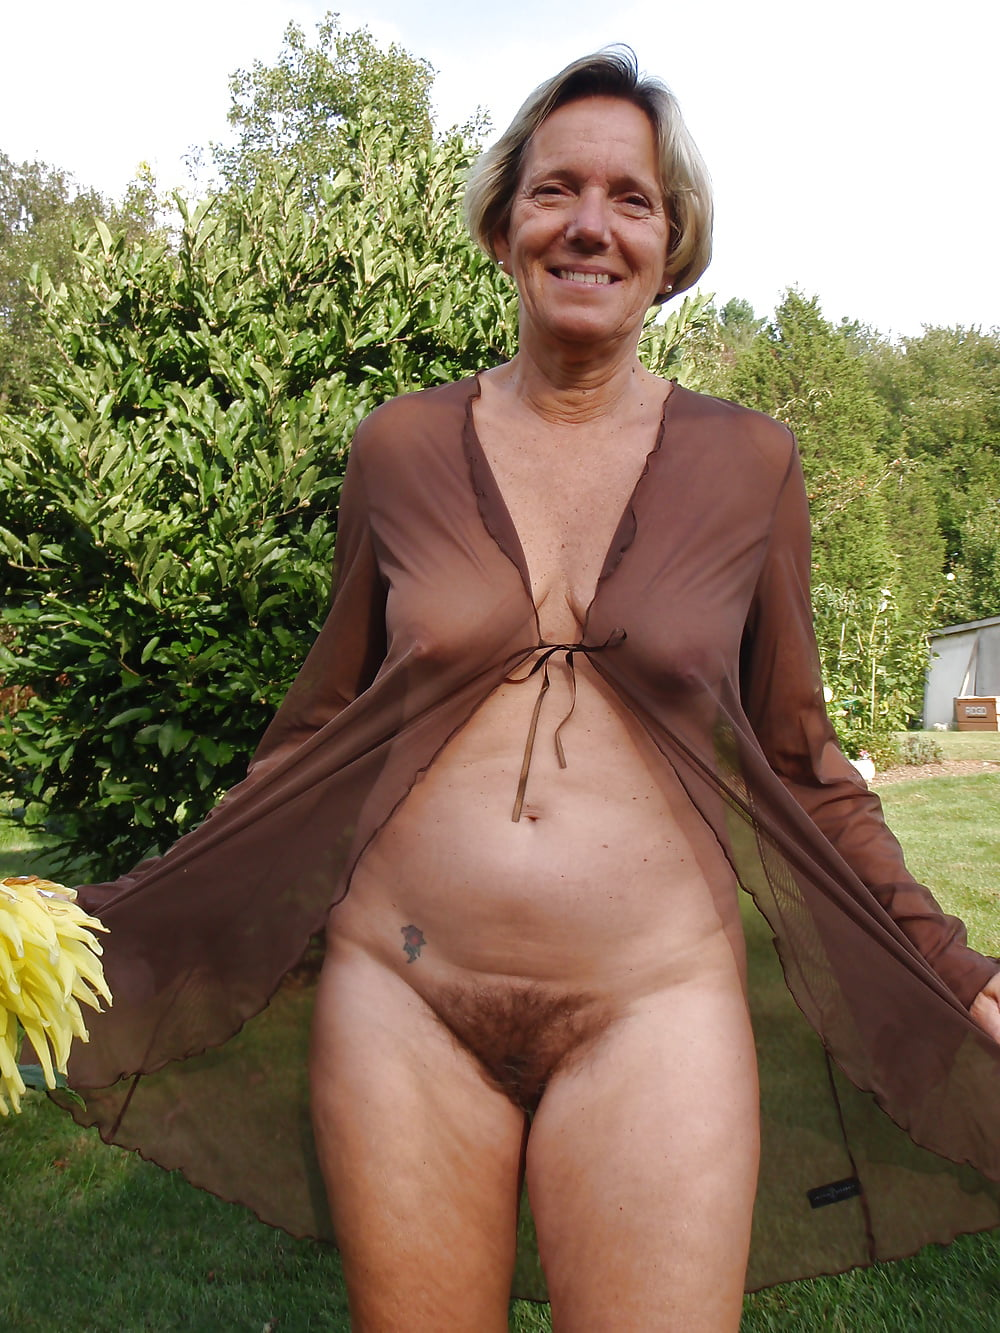 Blonde pubic nude